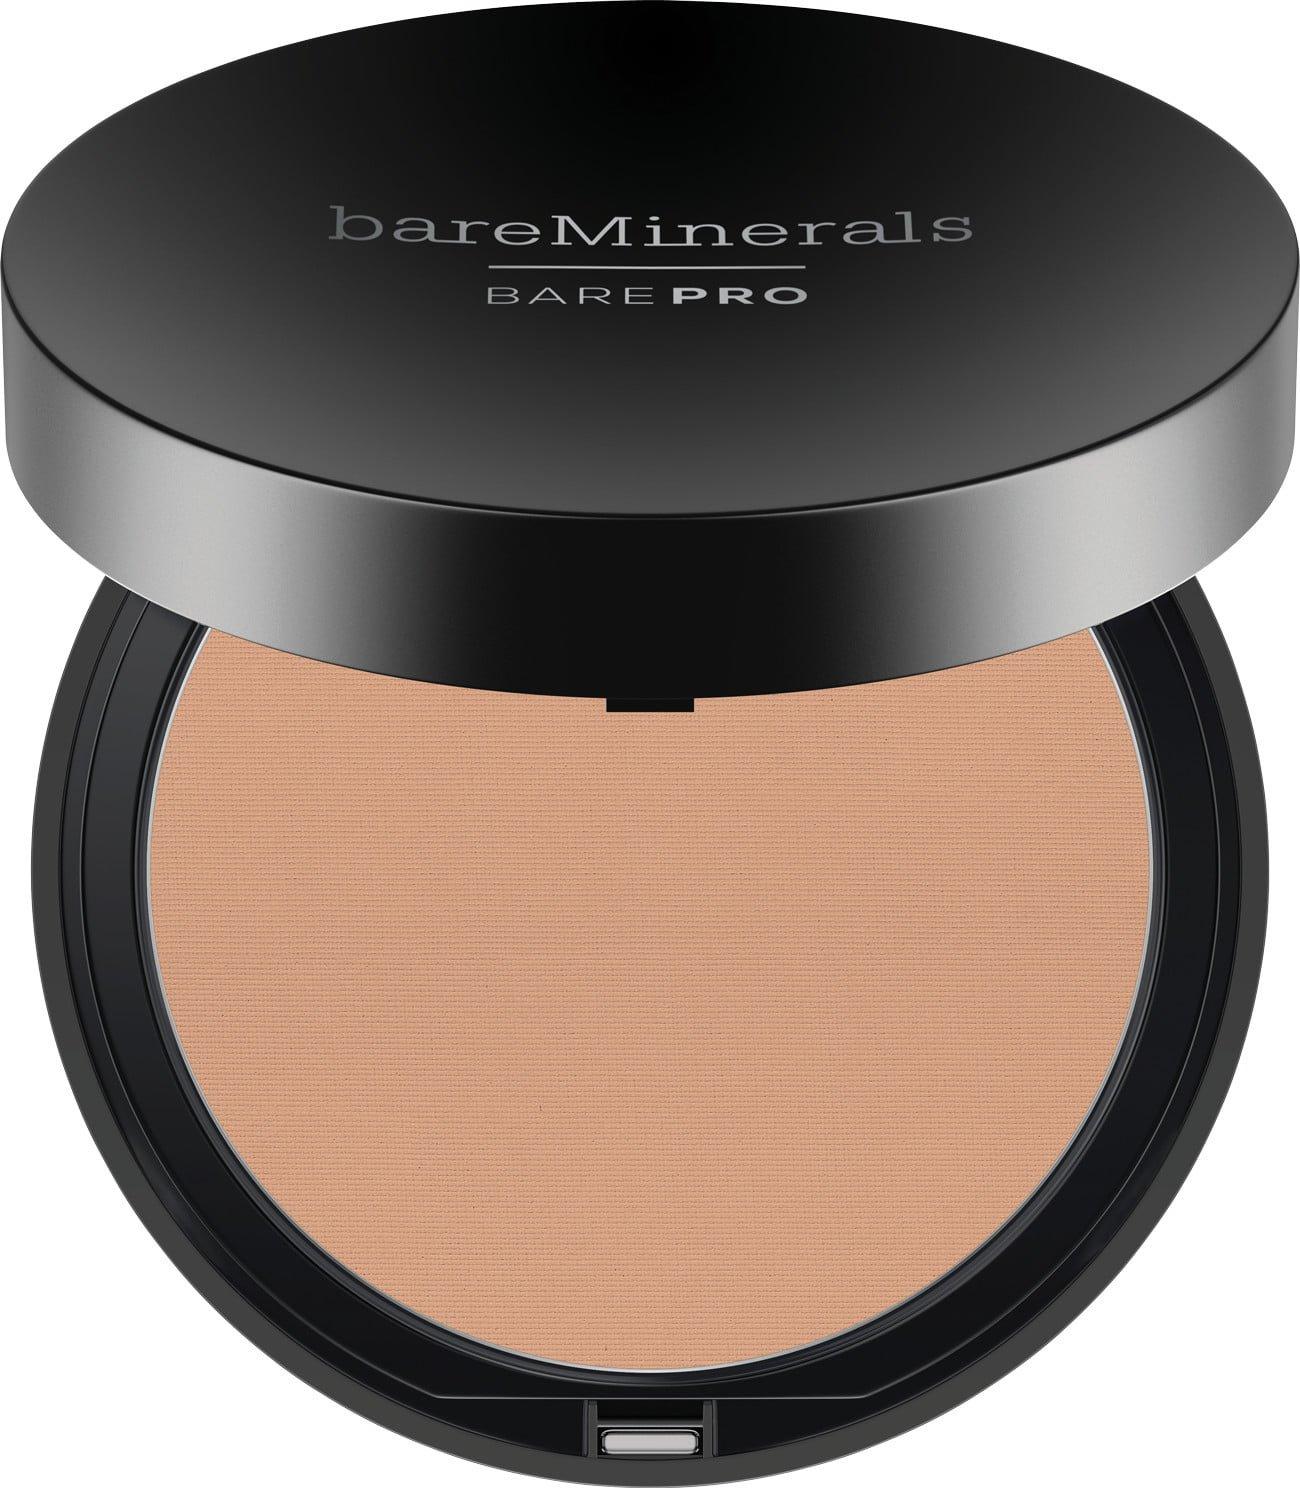 bareMinerals Barepro Performance Wear Powder Foundation, Cool Beige, 0.34 Ounce